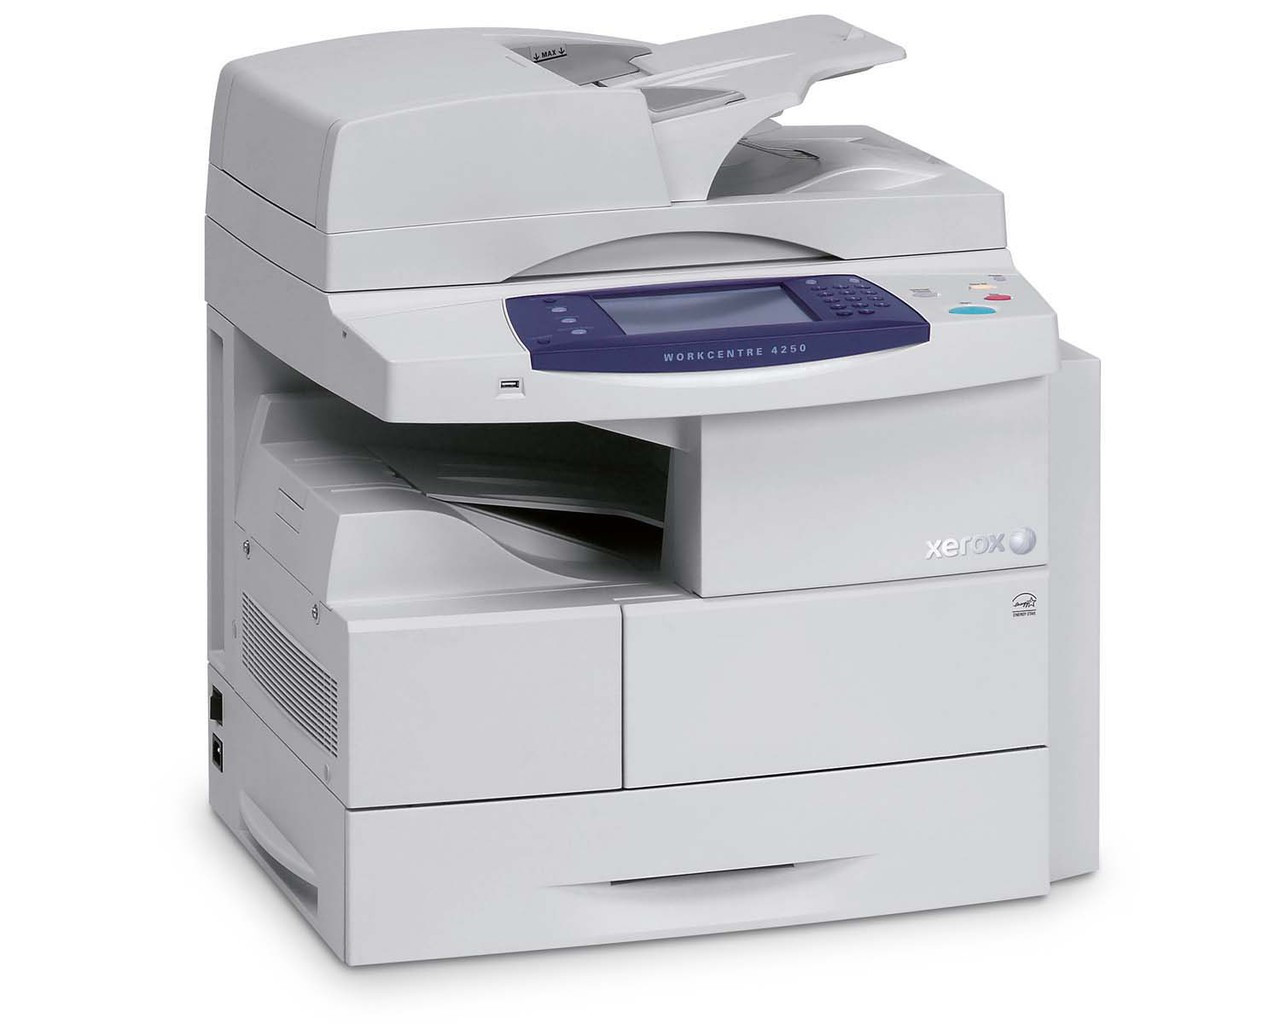 Xerox WC4250X Copier MFP Laser Printer